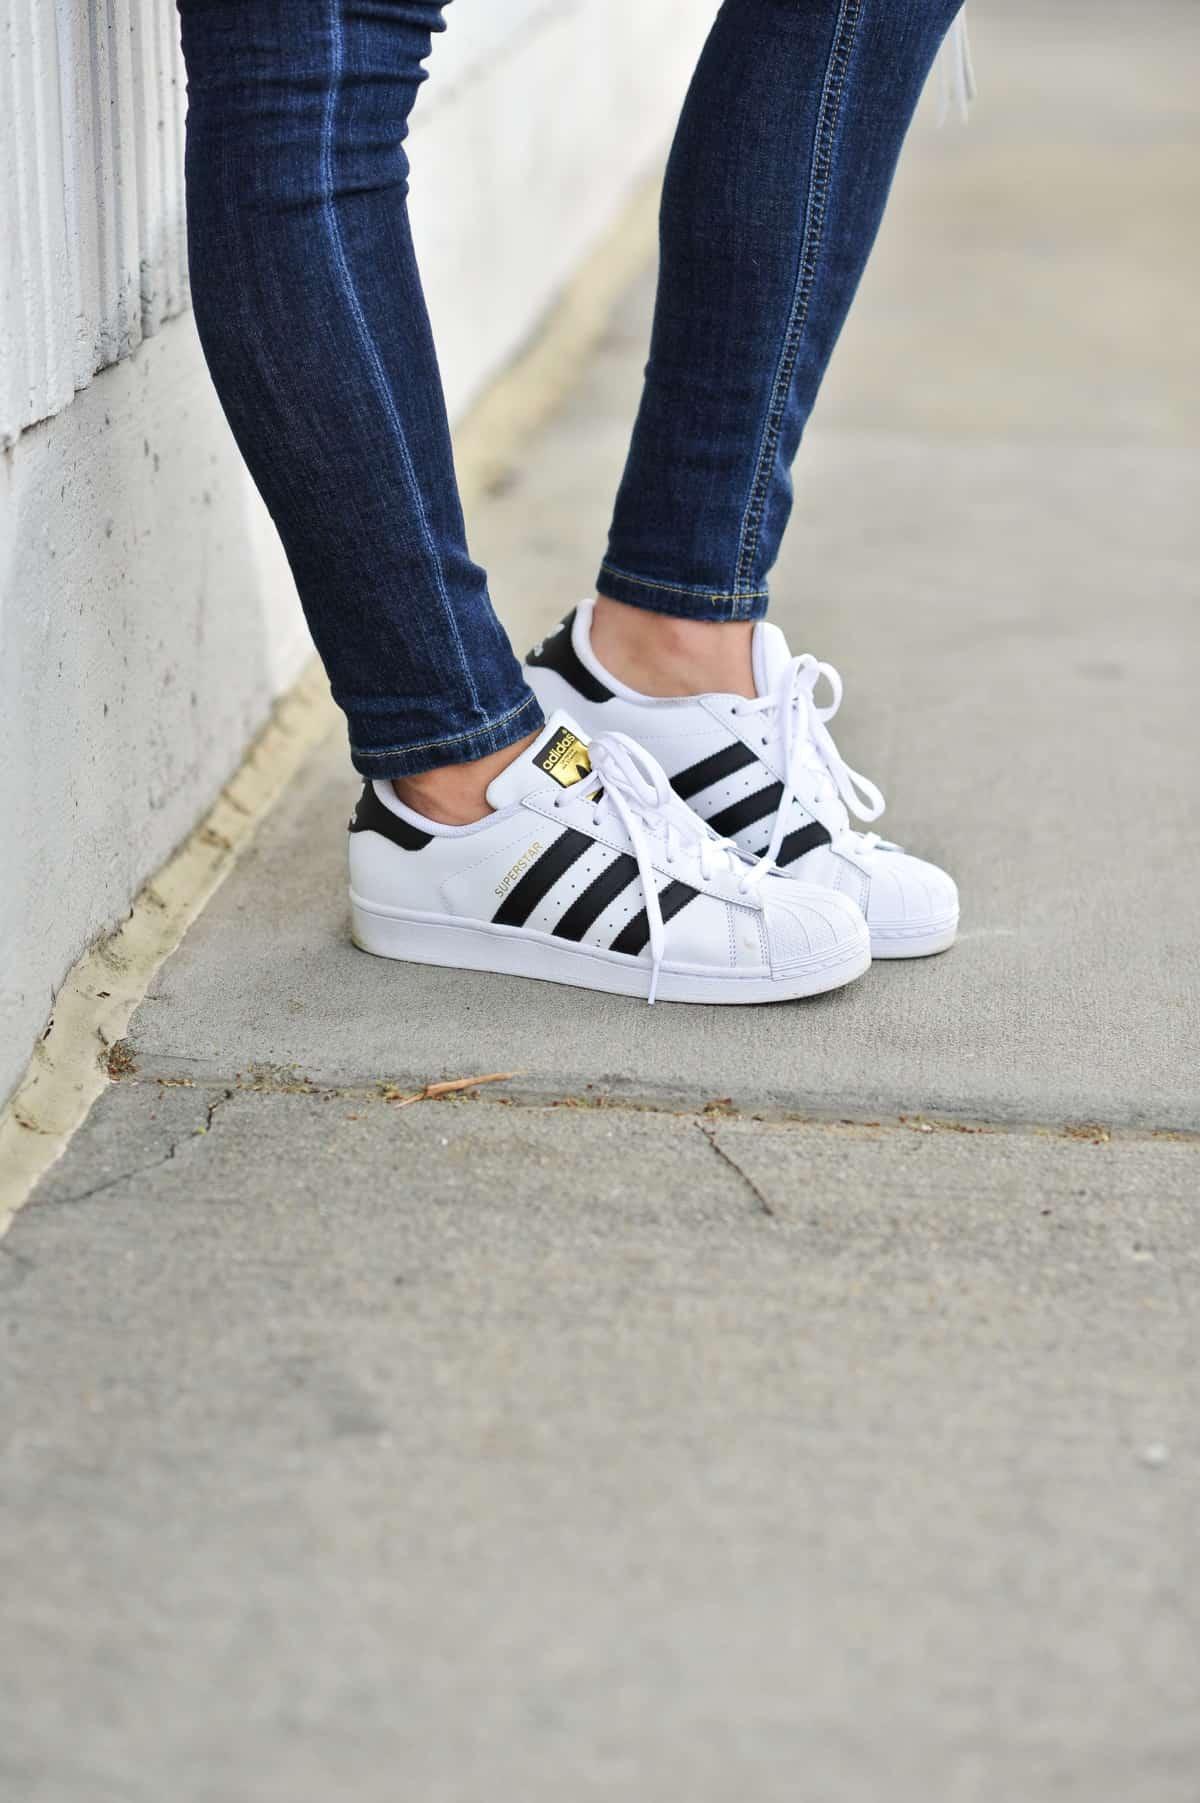 Adidas Originals and jeans